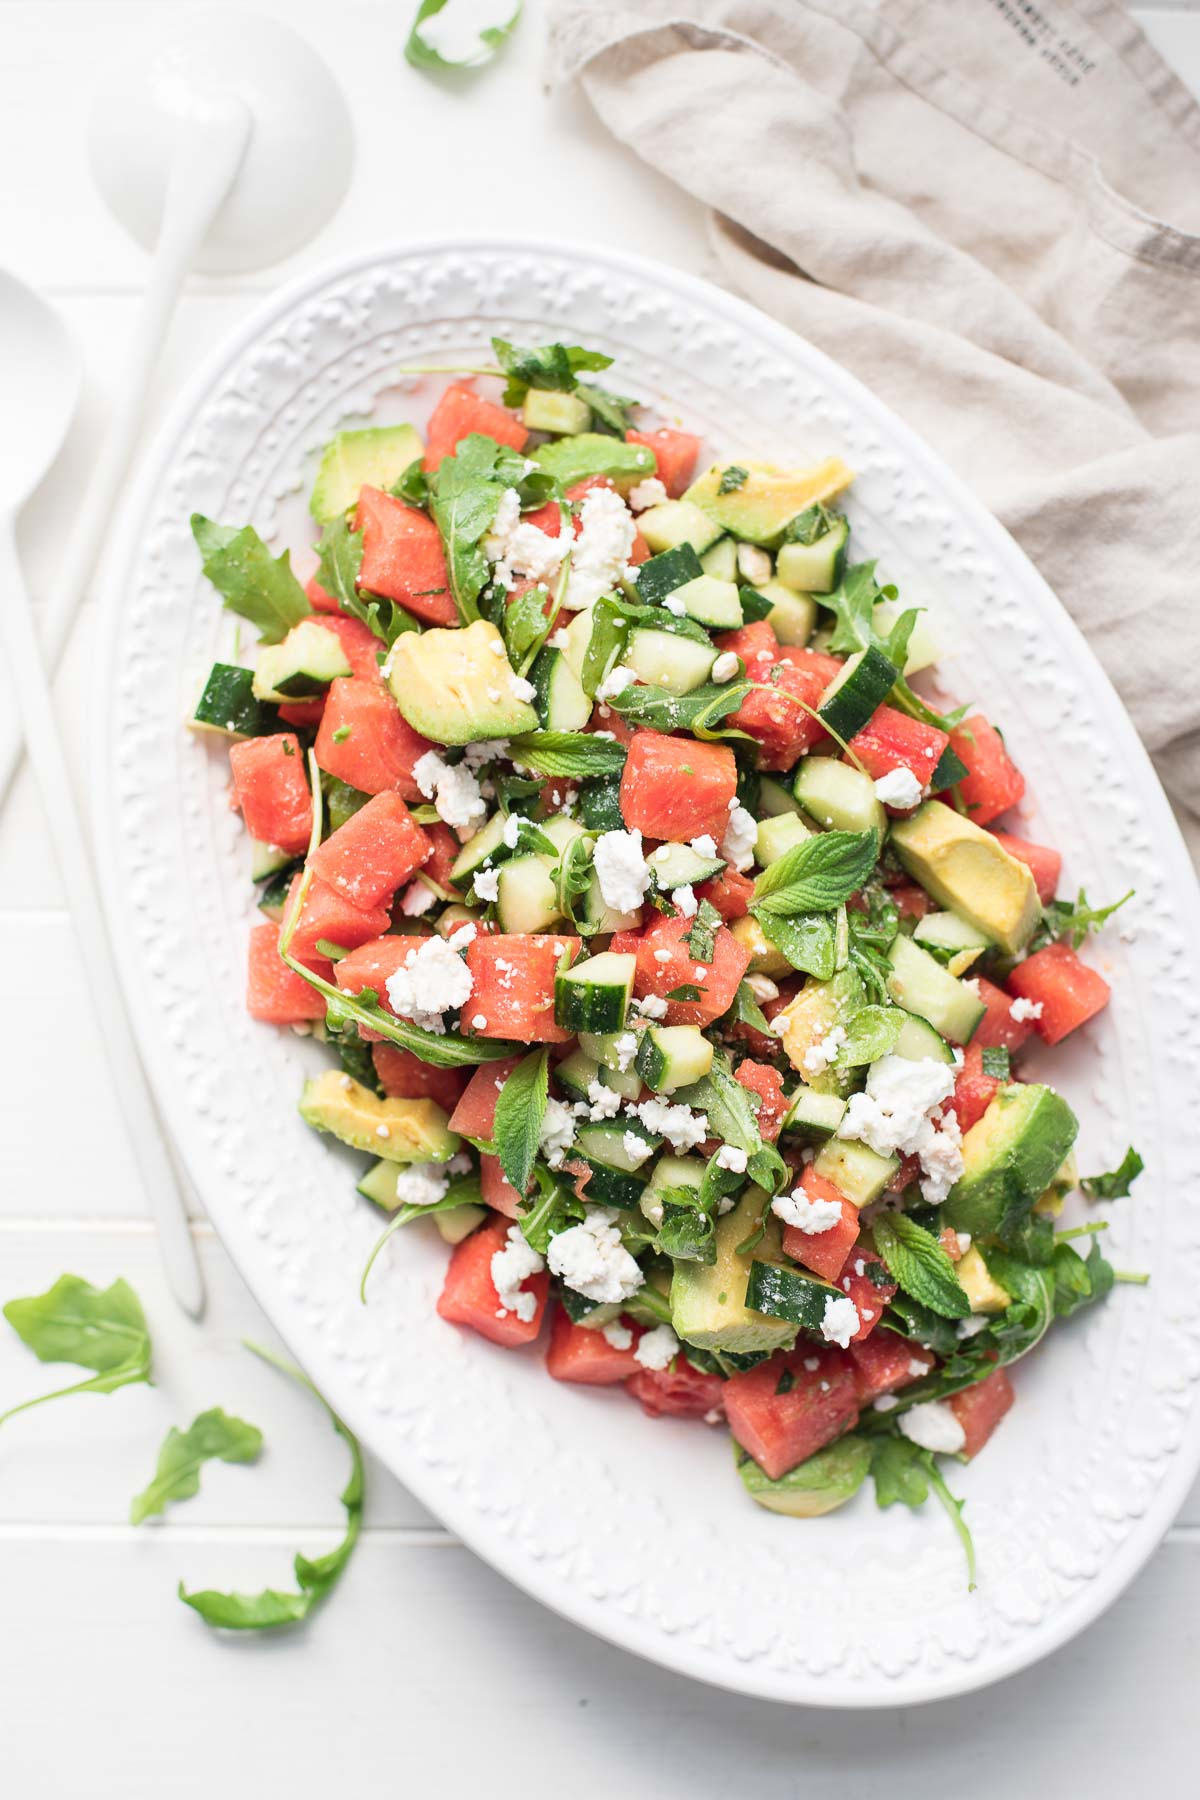 Watermelon Salad with Feta, Cucumber, Avocado & Mint